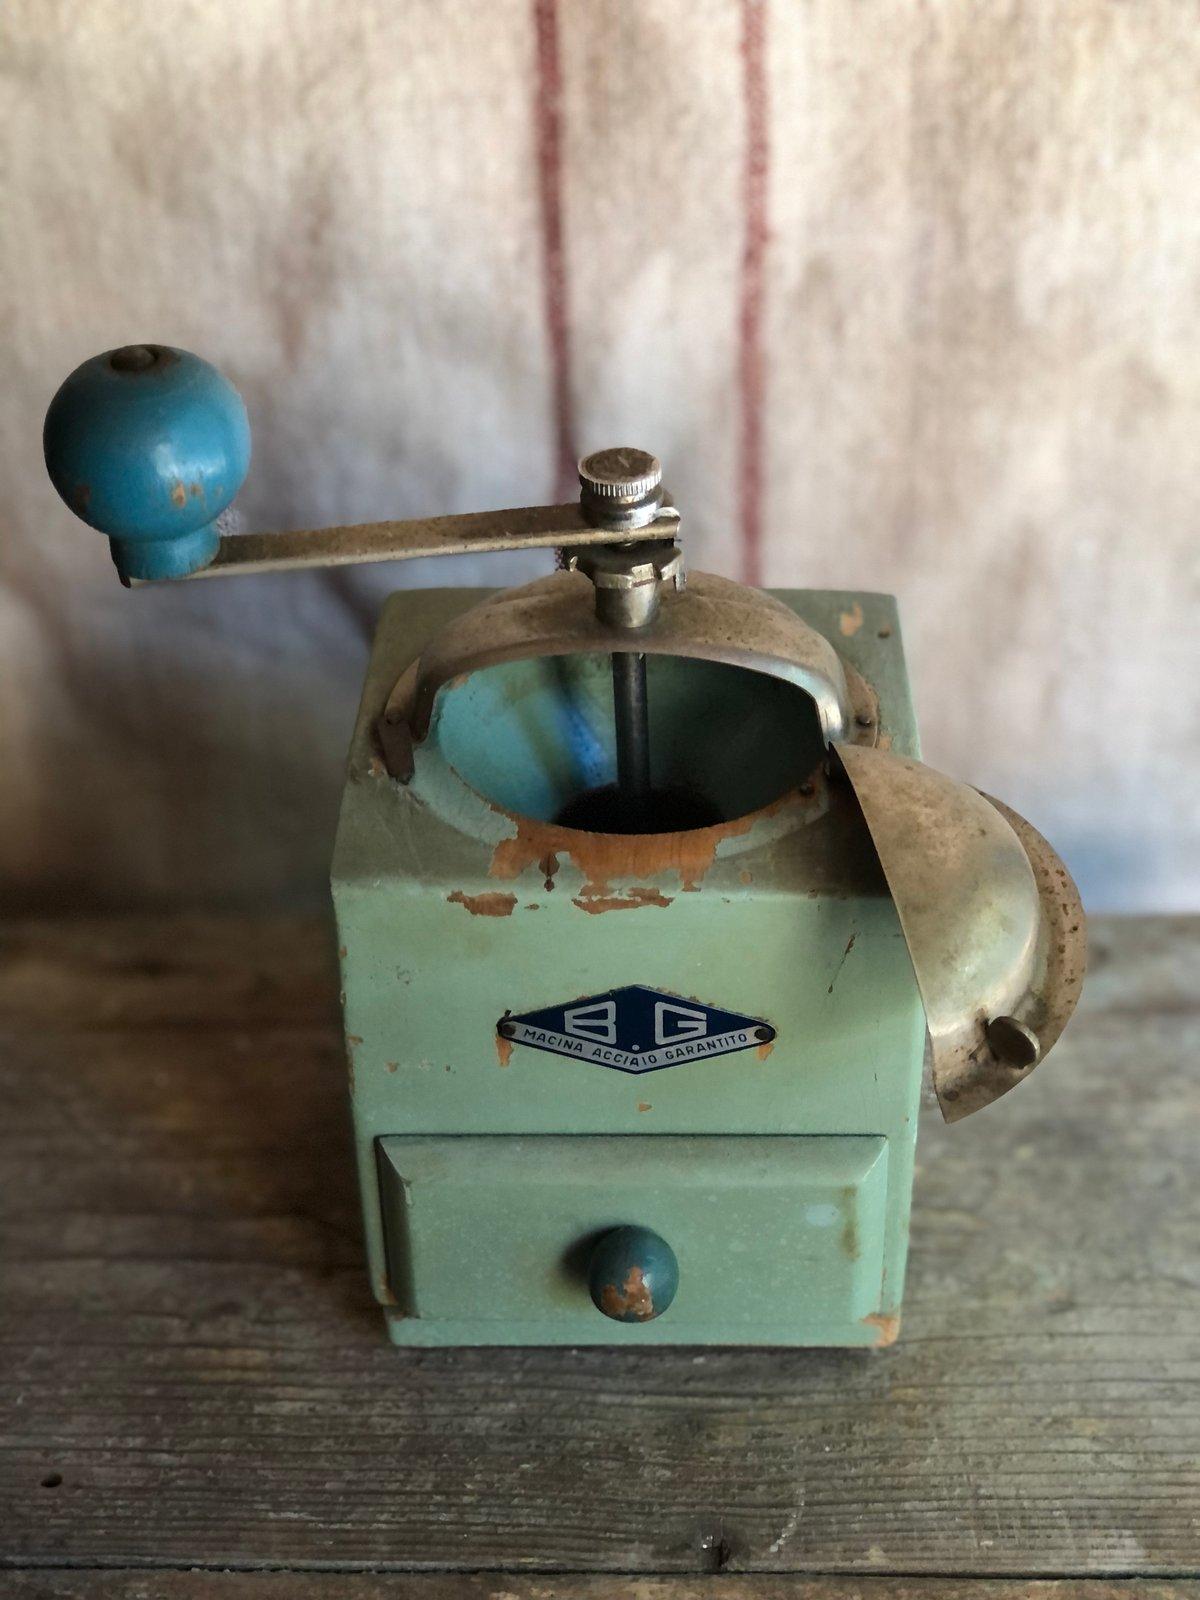 Image of Italian coffee grinder